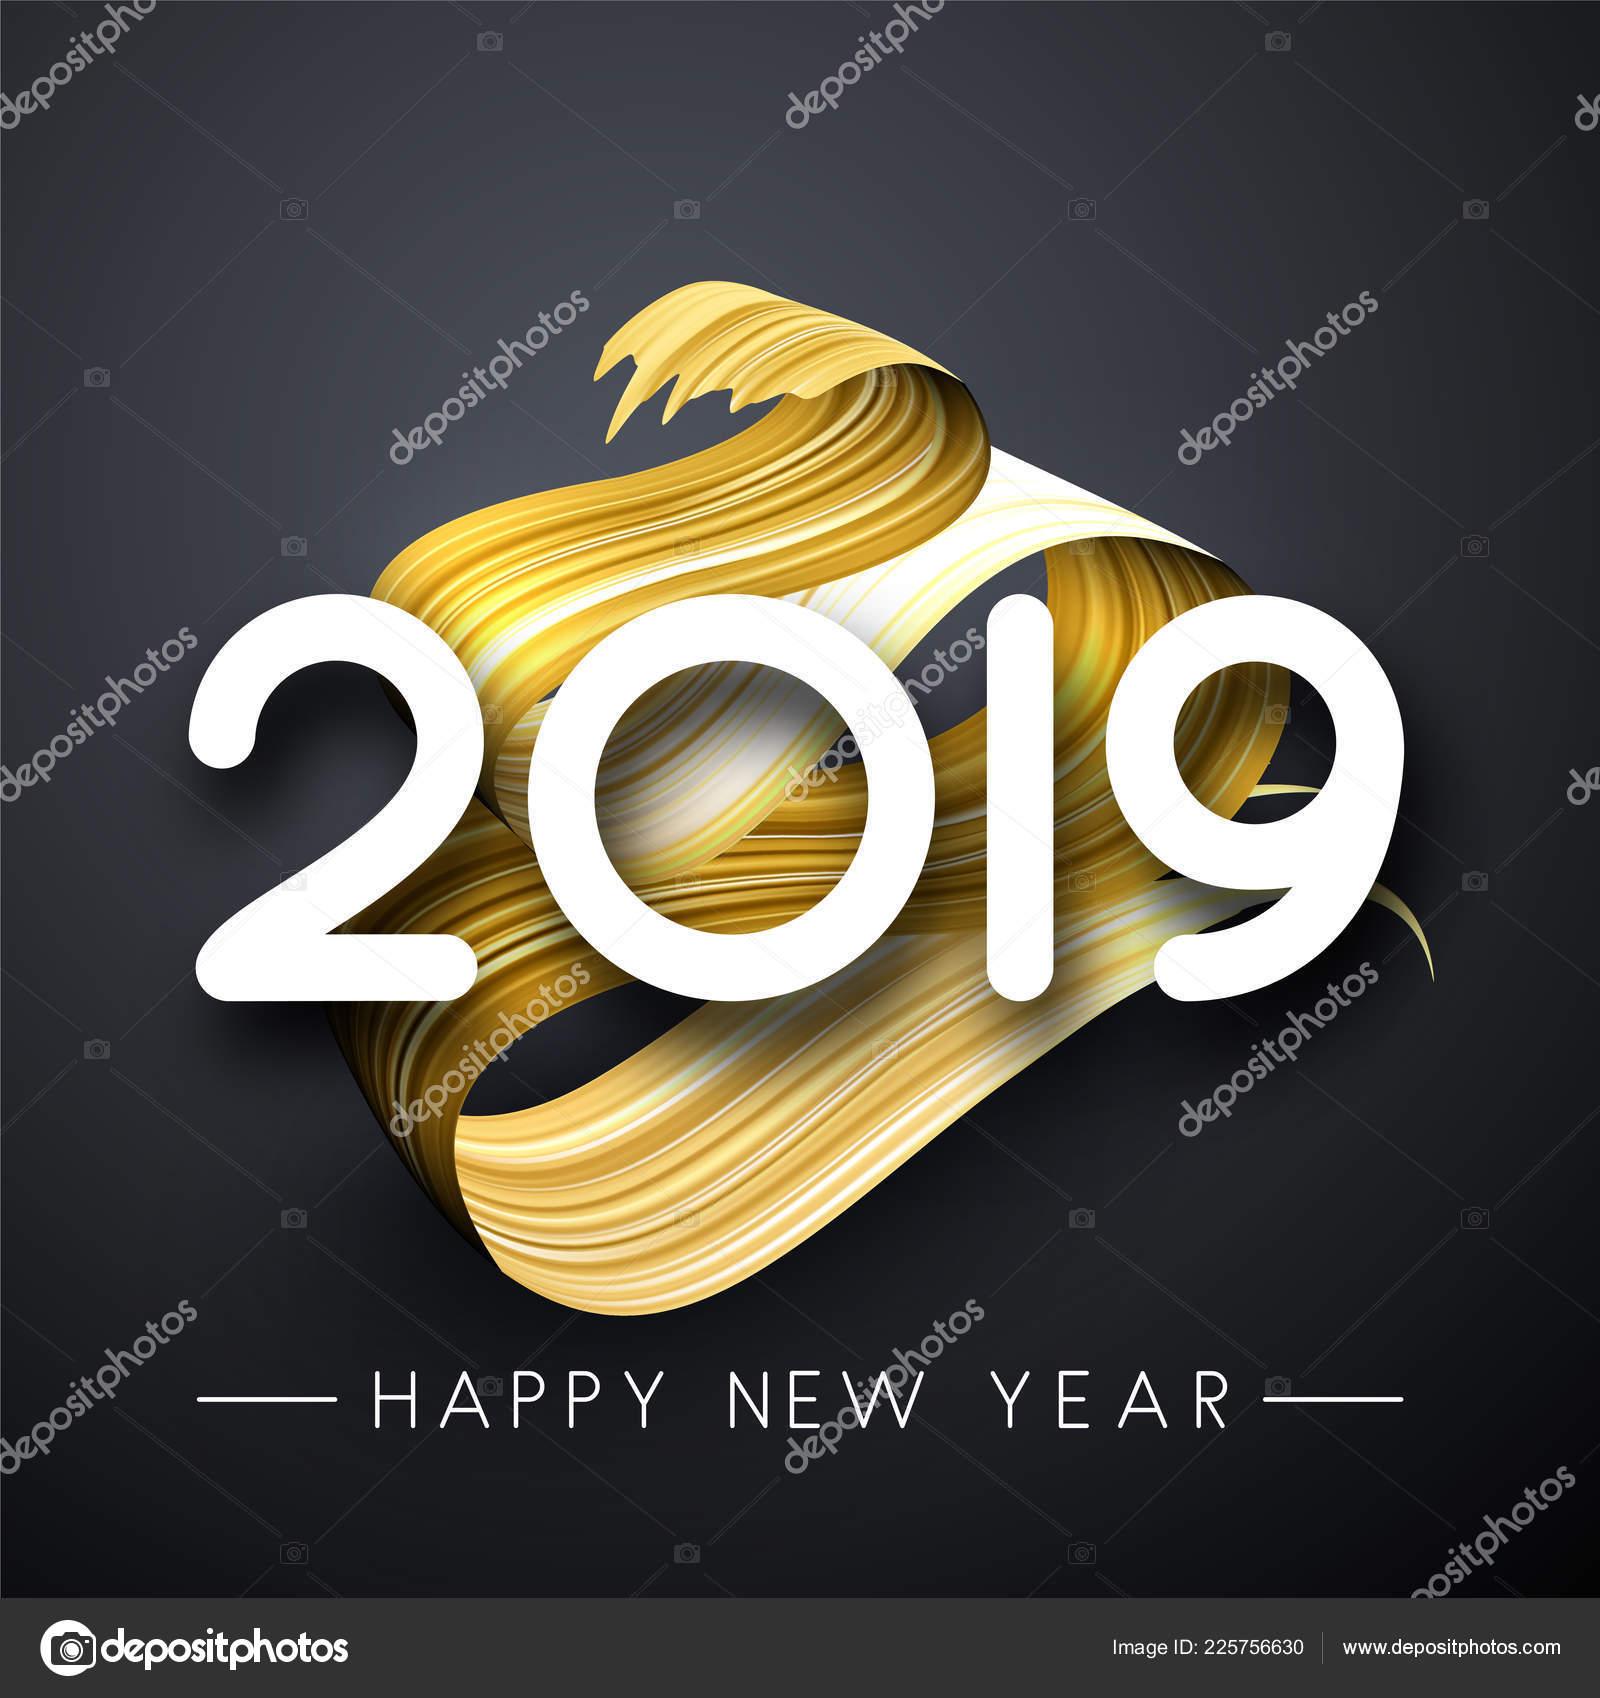 Happy New Year 2019 Greeting Card Golden Brush Stroke Design — Stock ...